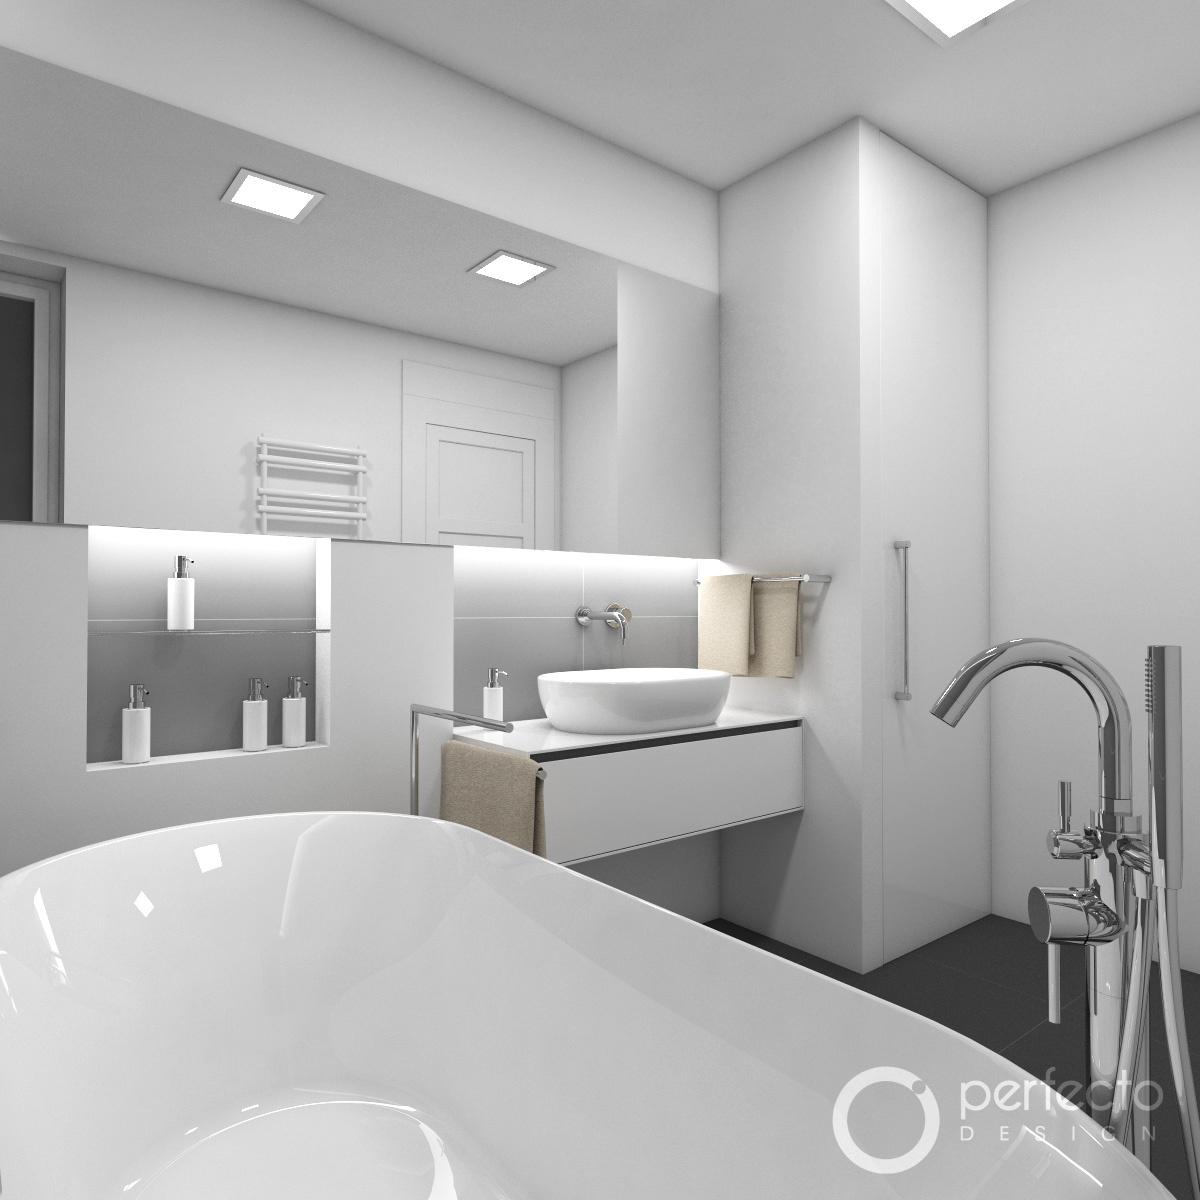 modernes badezimmer toronto perfecto design. Black Bedroom Furniture Sets. Home Design Ideas